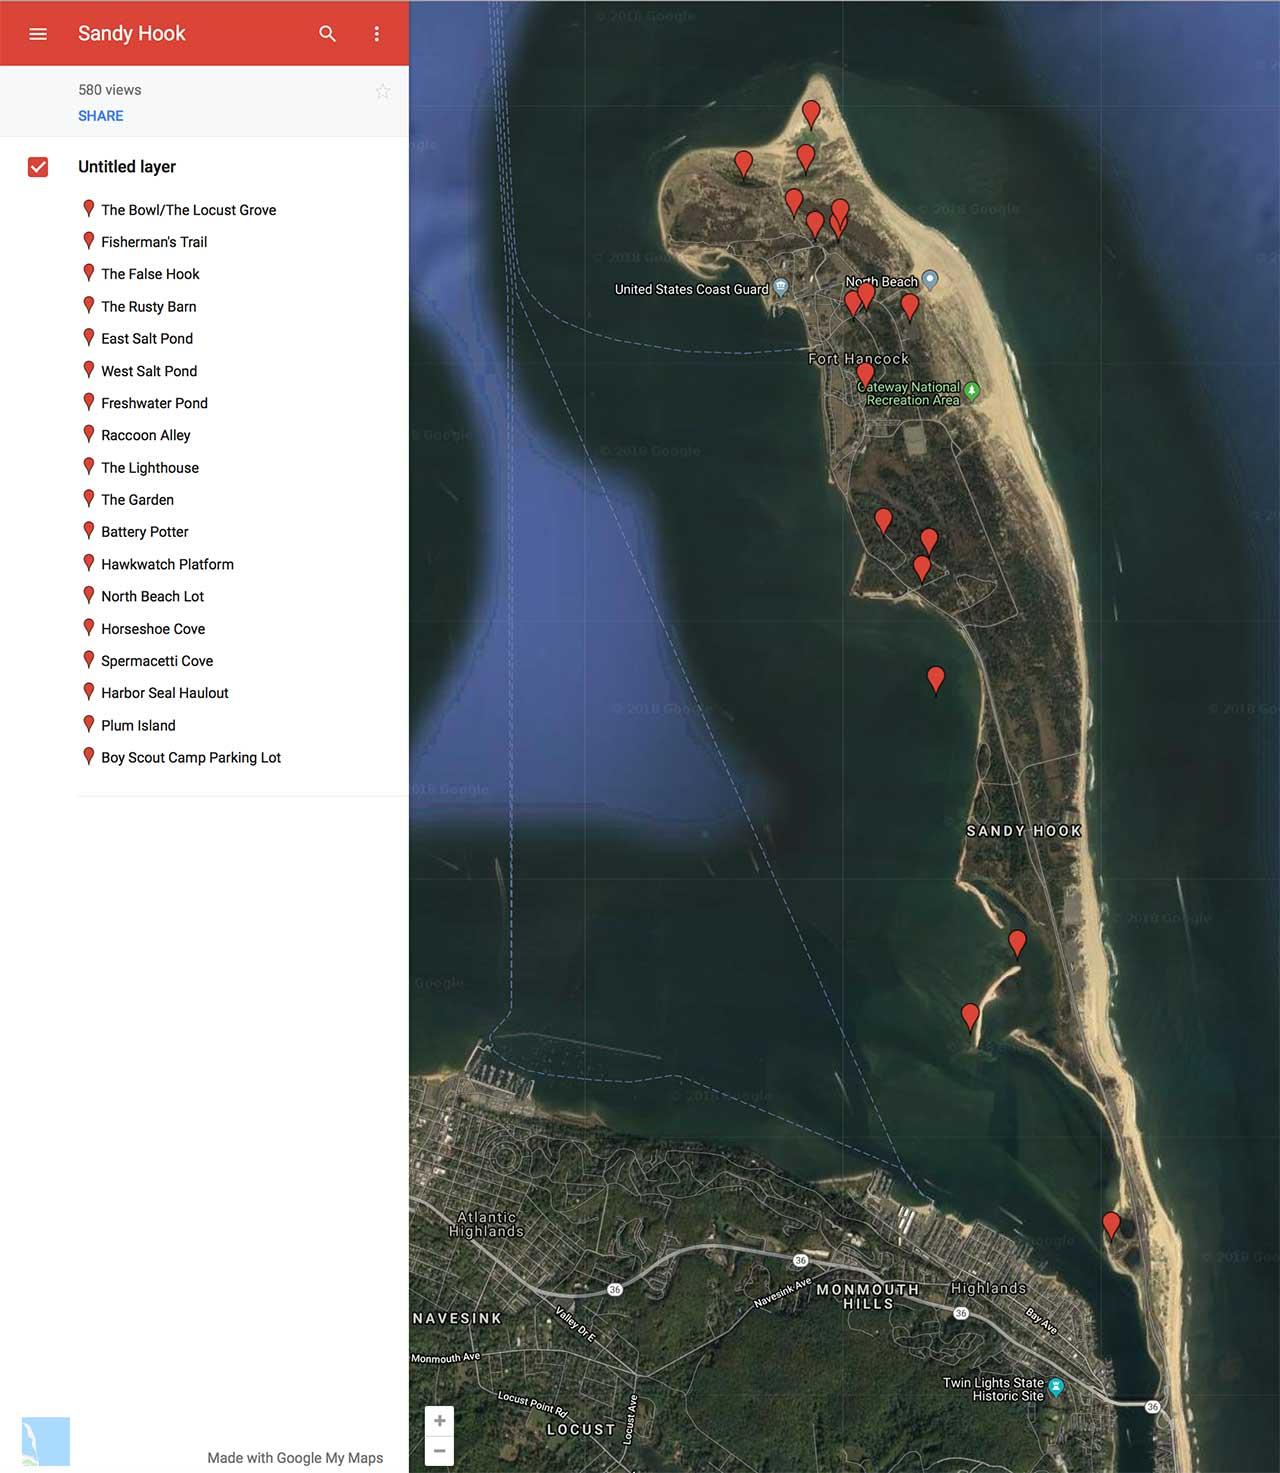 Washington Map Society.Sandy Hook Birding Washington Crossing Audubon Society Website